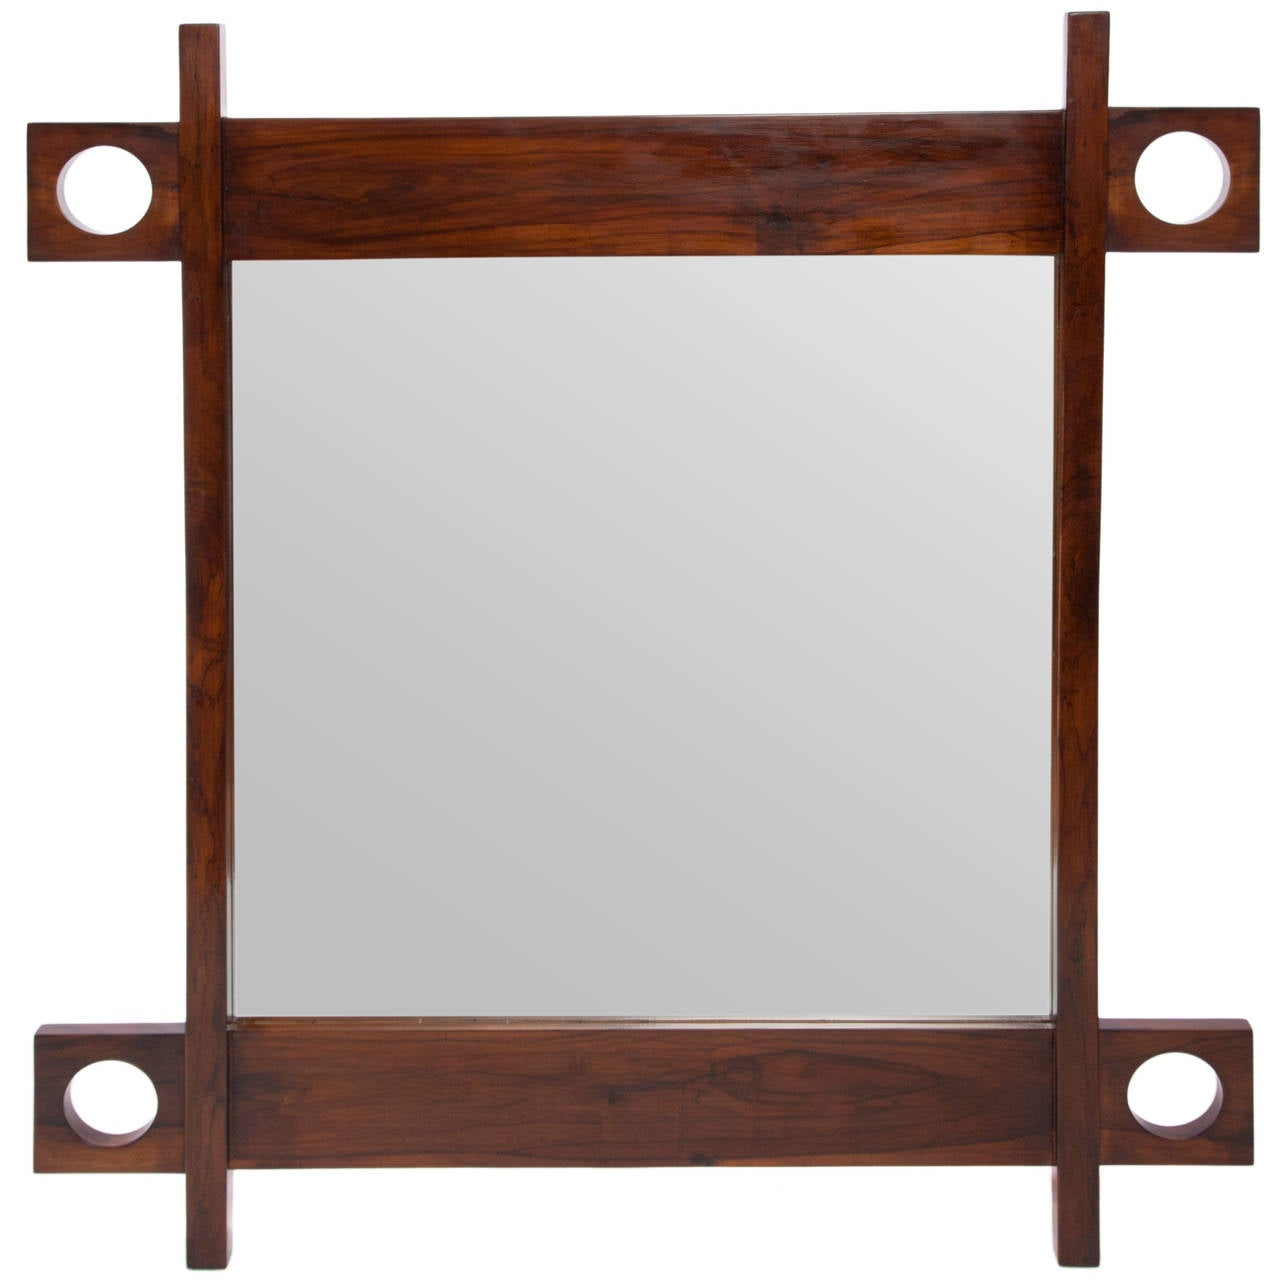 A Sergio Rodrigues 'Cuiaba' Wall Mirror with Jacaranda Wood Frame